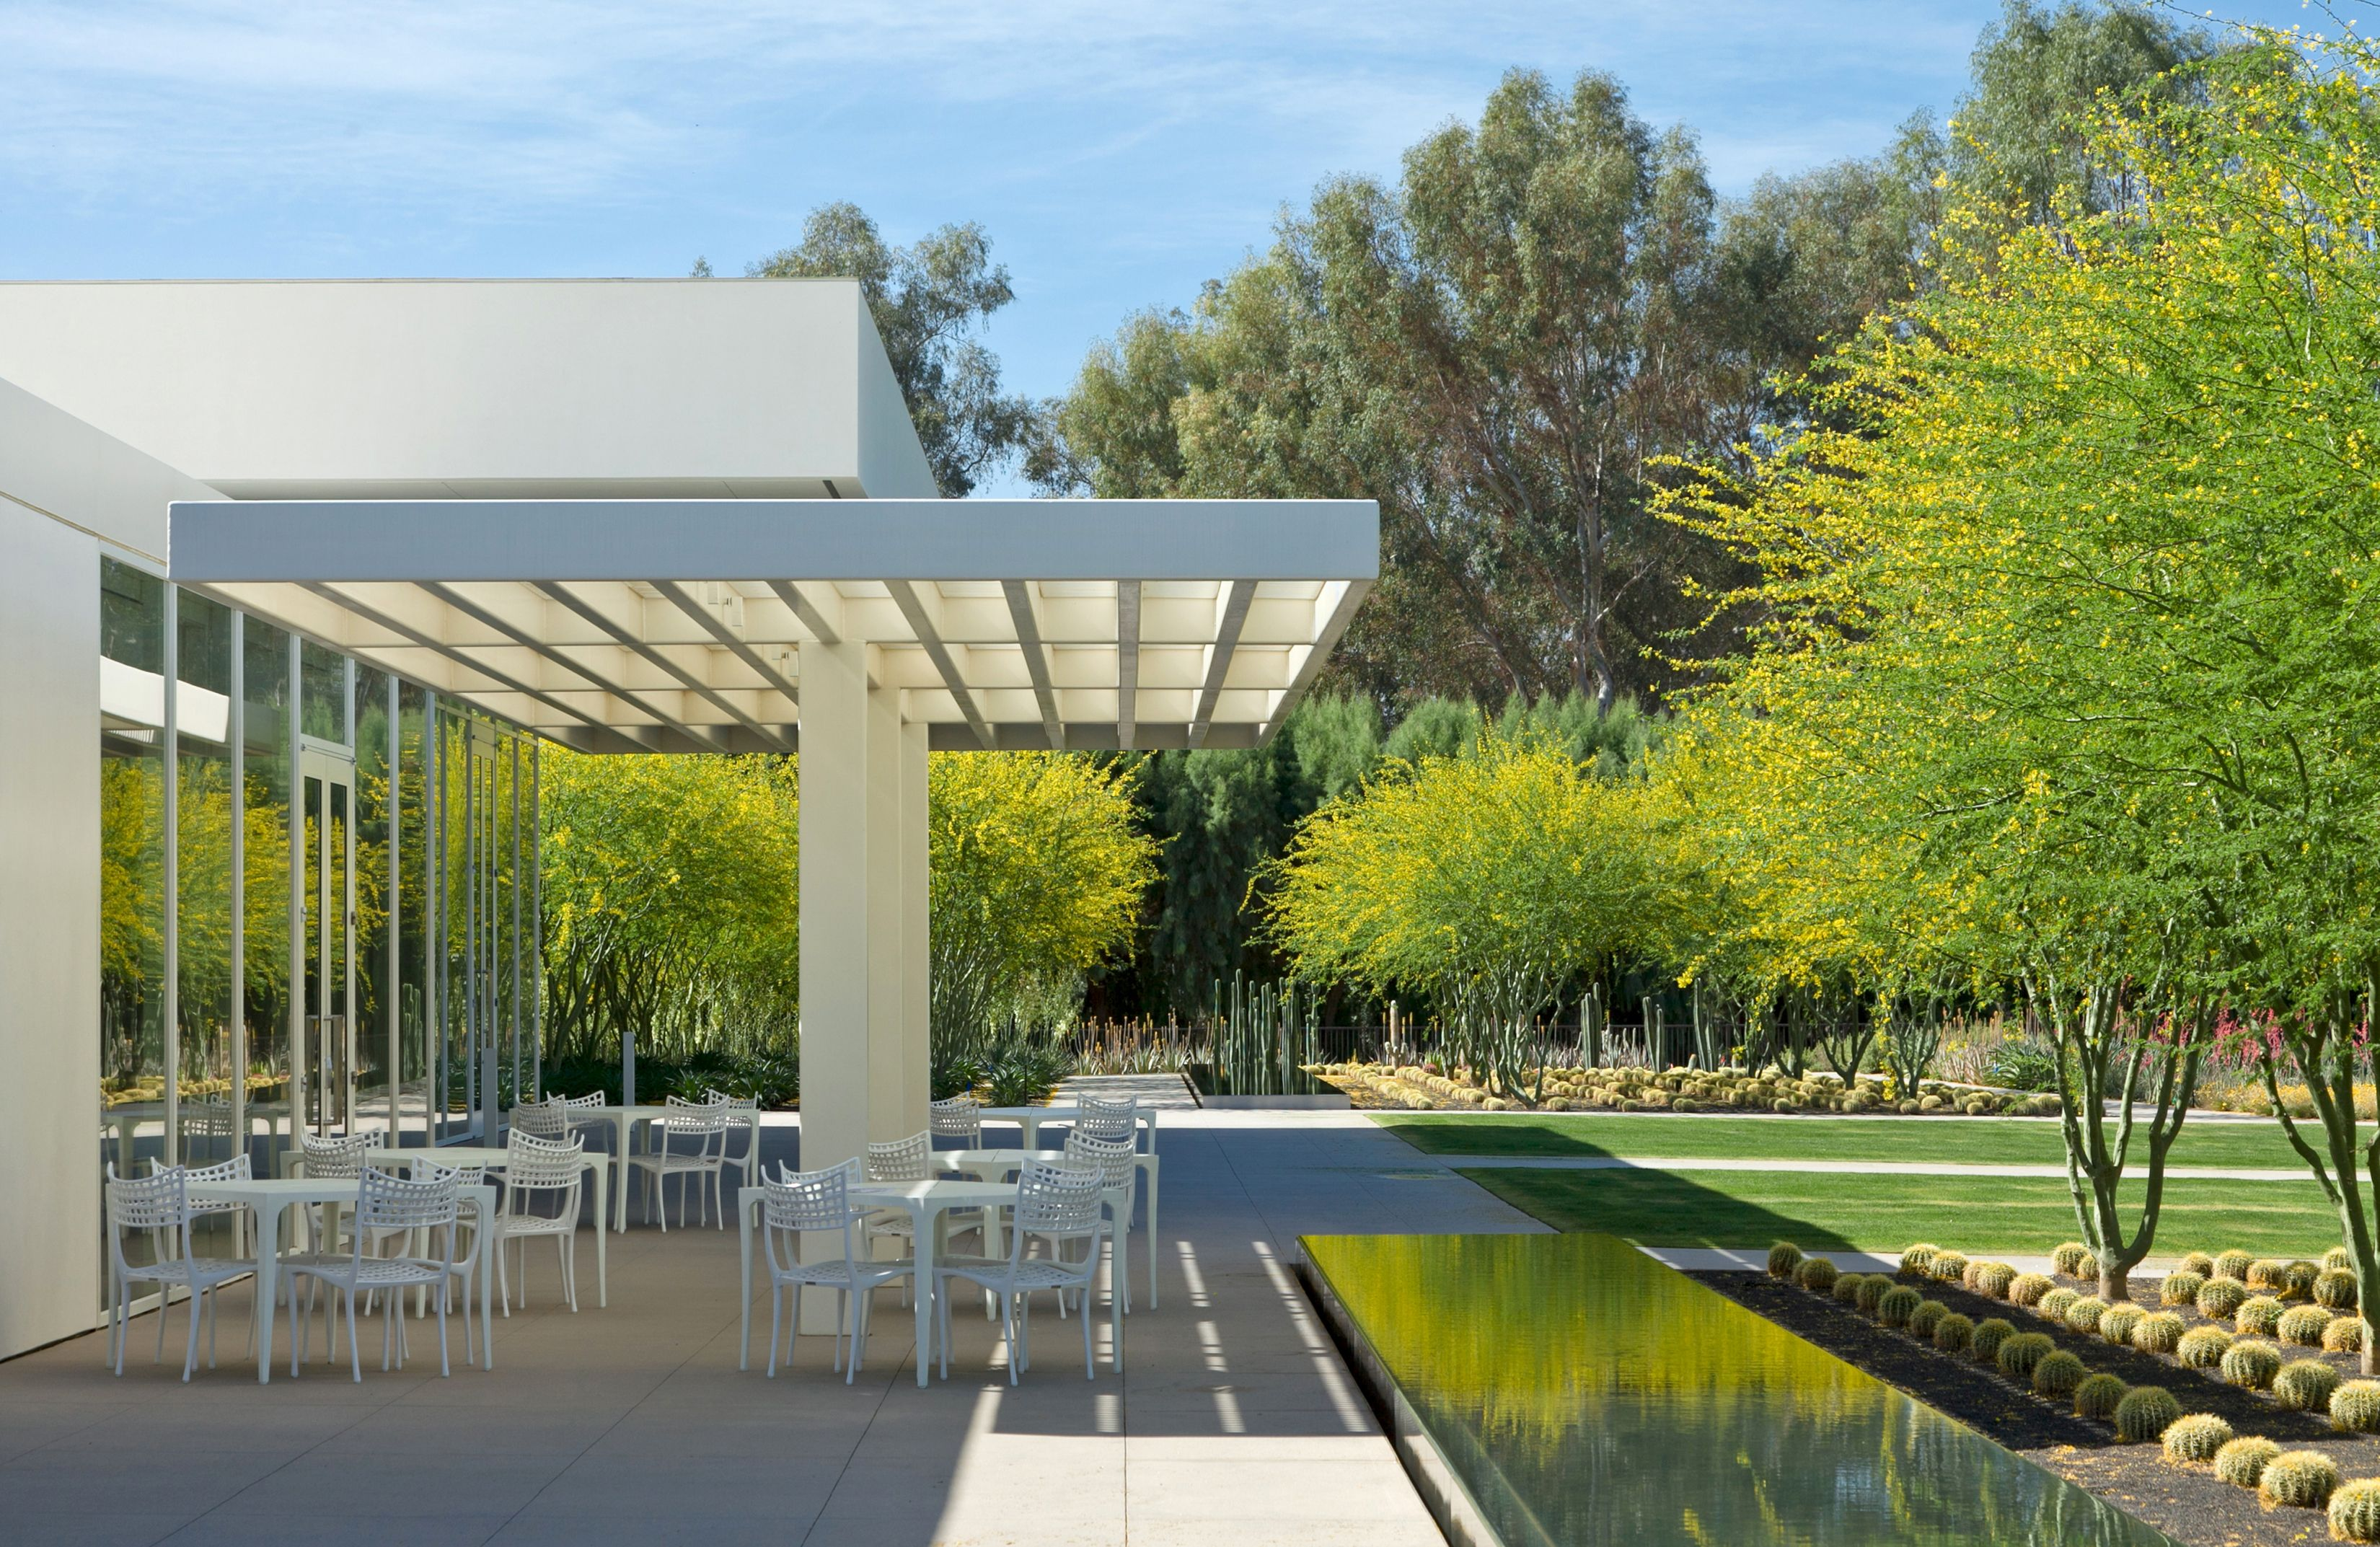 Landscape Design James Burnett Sunnylands Center Rancho Mirage Landscape Architecture